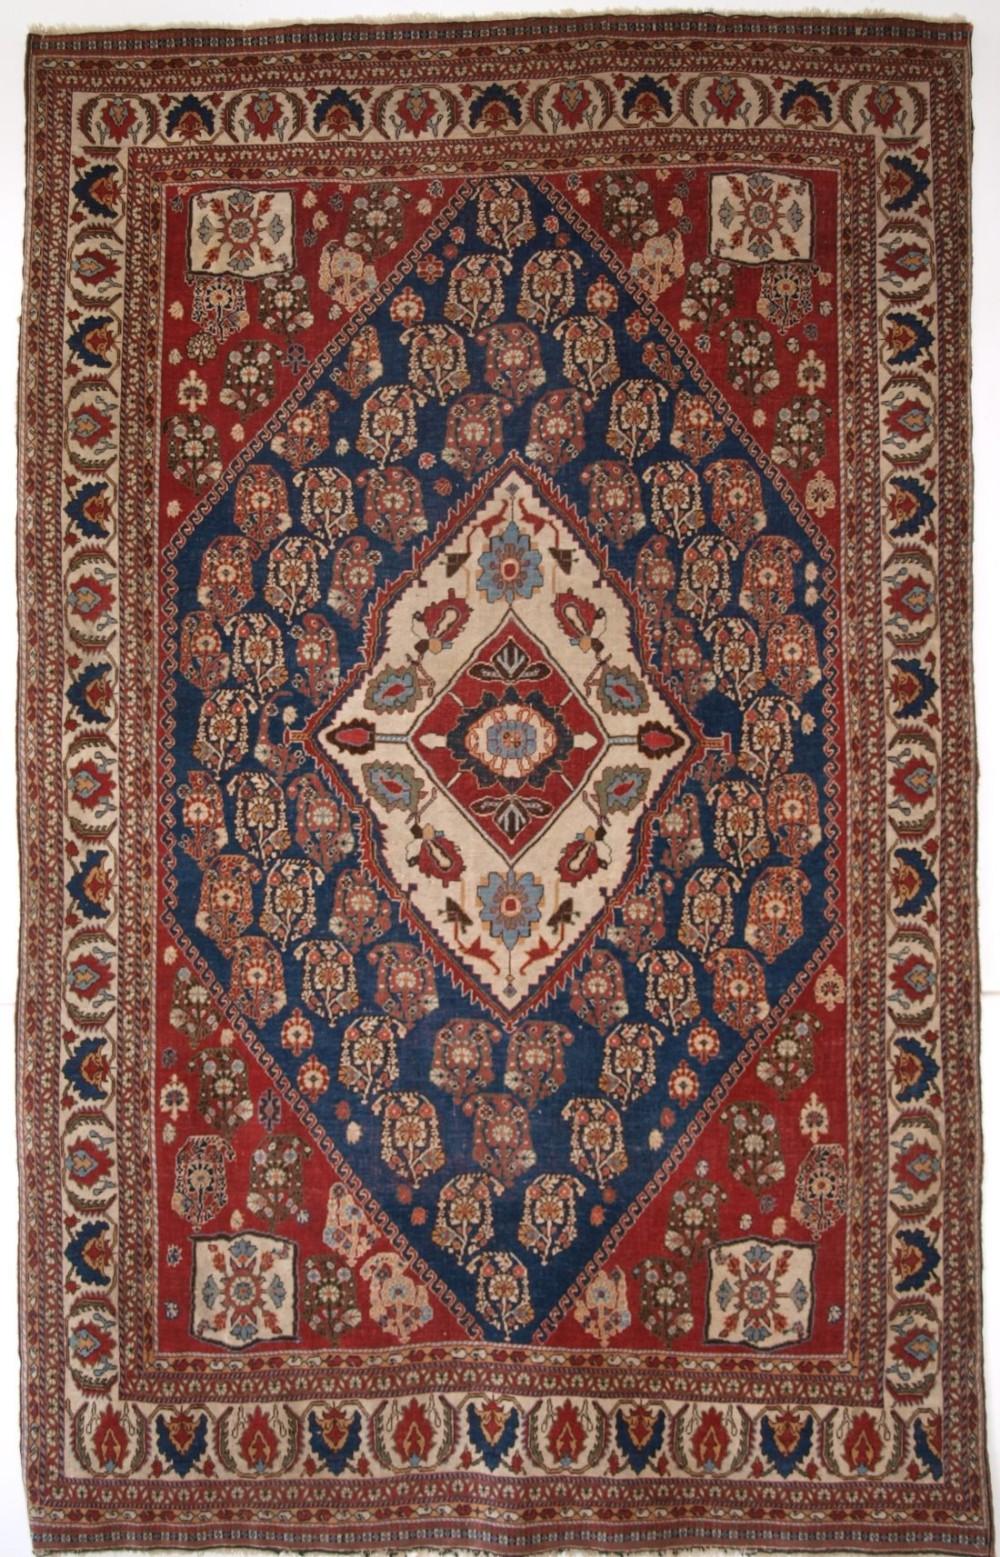 antique persian tribal qashqai kashkuli rug tribal weaving of the highest quality circa 1880